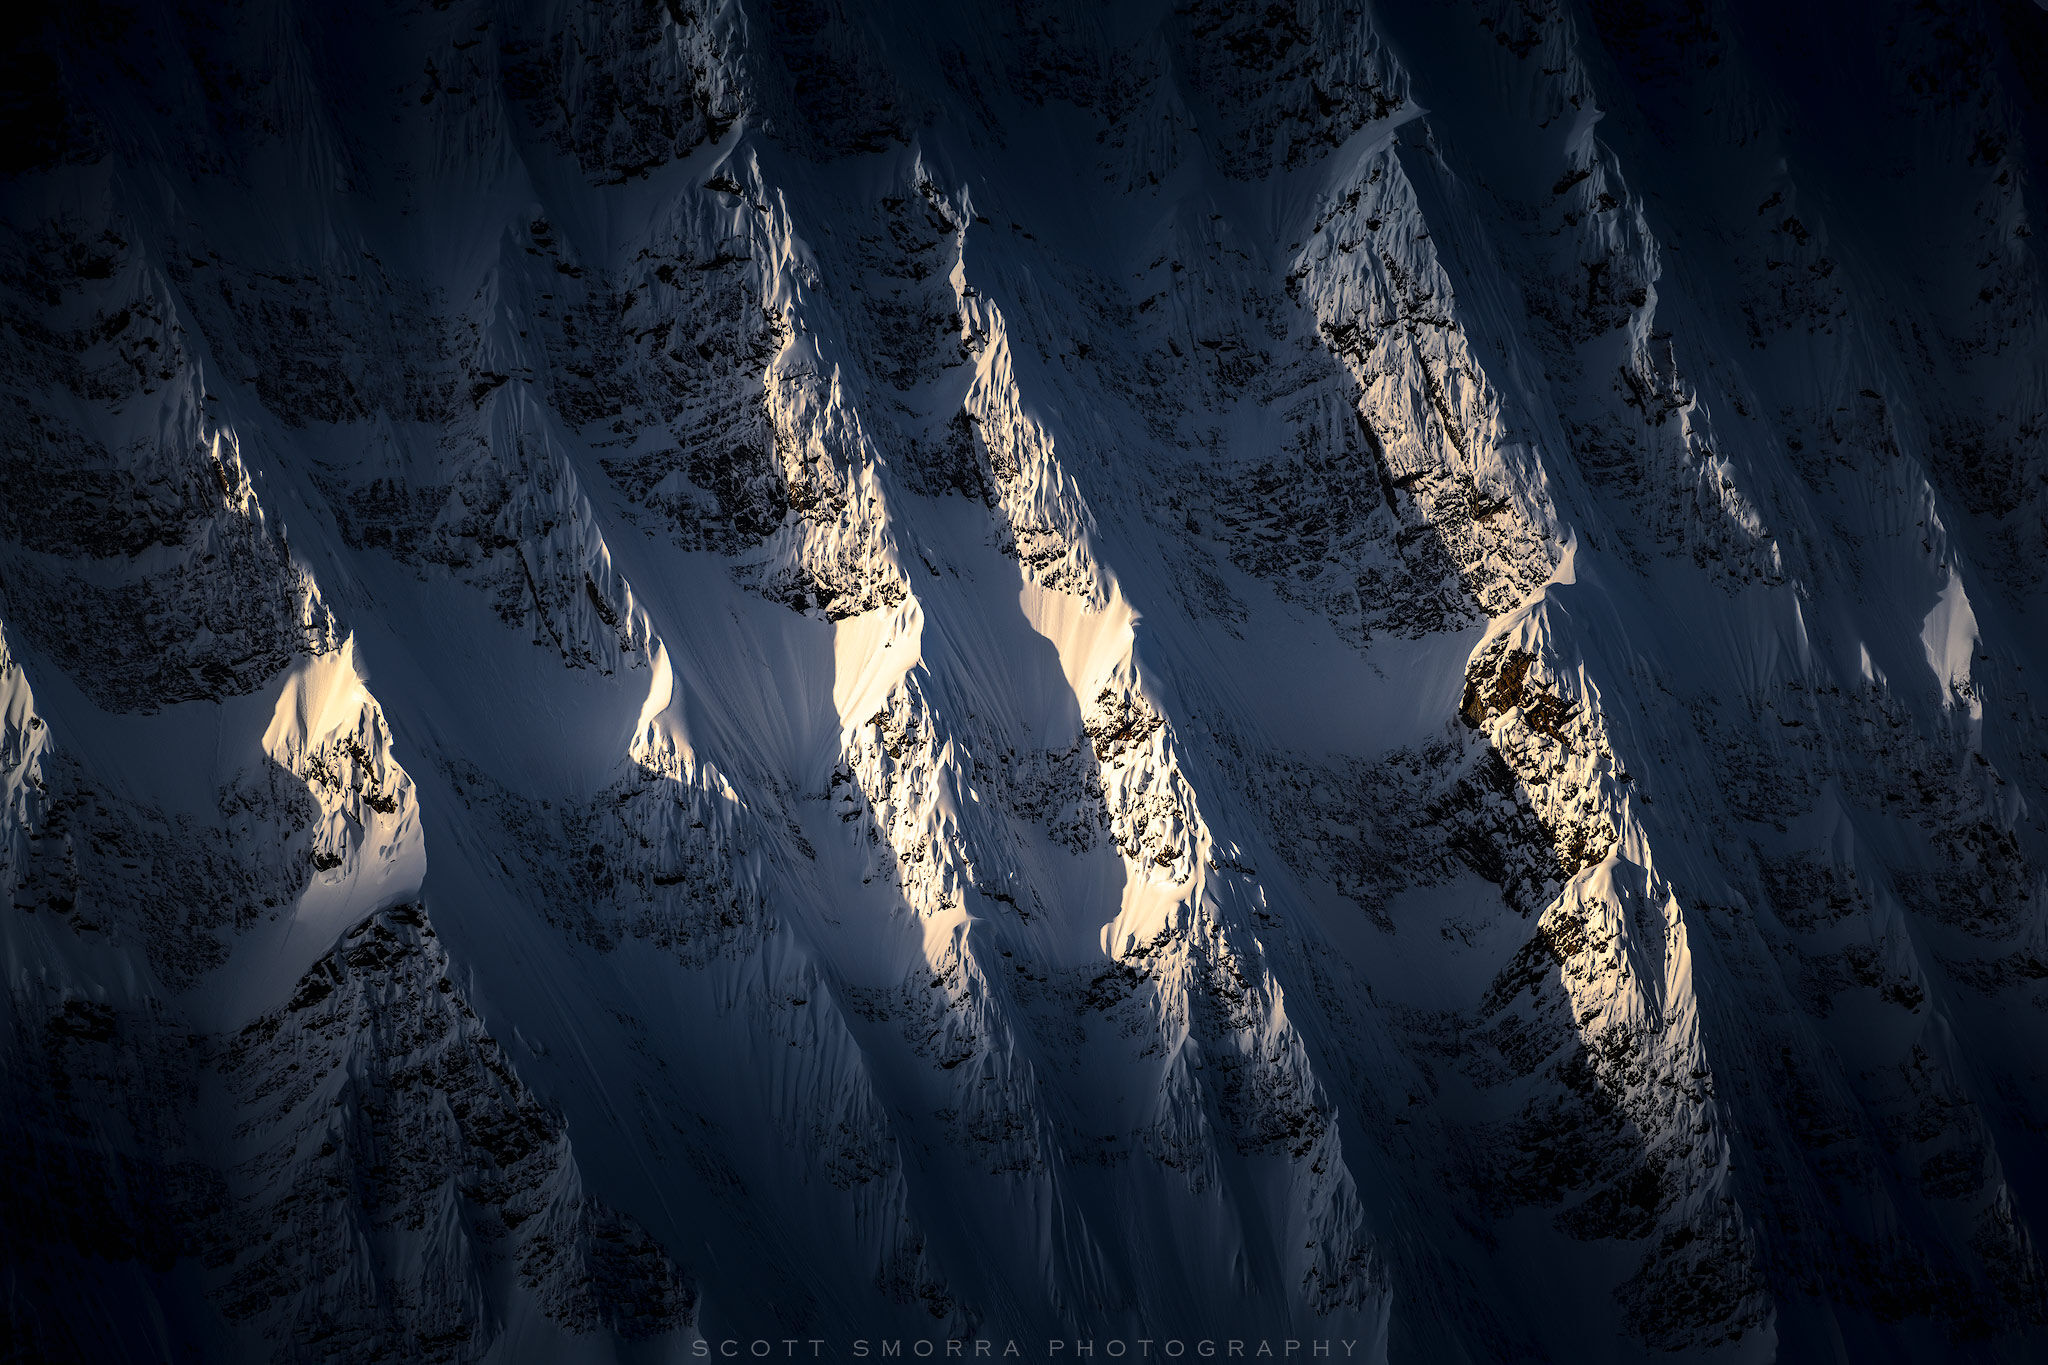 Fine Art Limited Edition of 50 - Early morning sunlight illuminates the fluted ridges on Mount Fryatt in Jasper National Park...